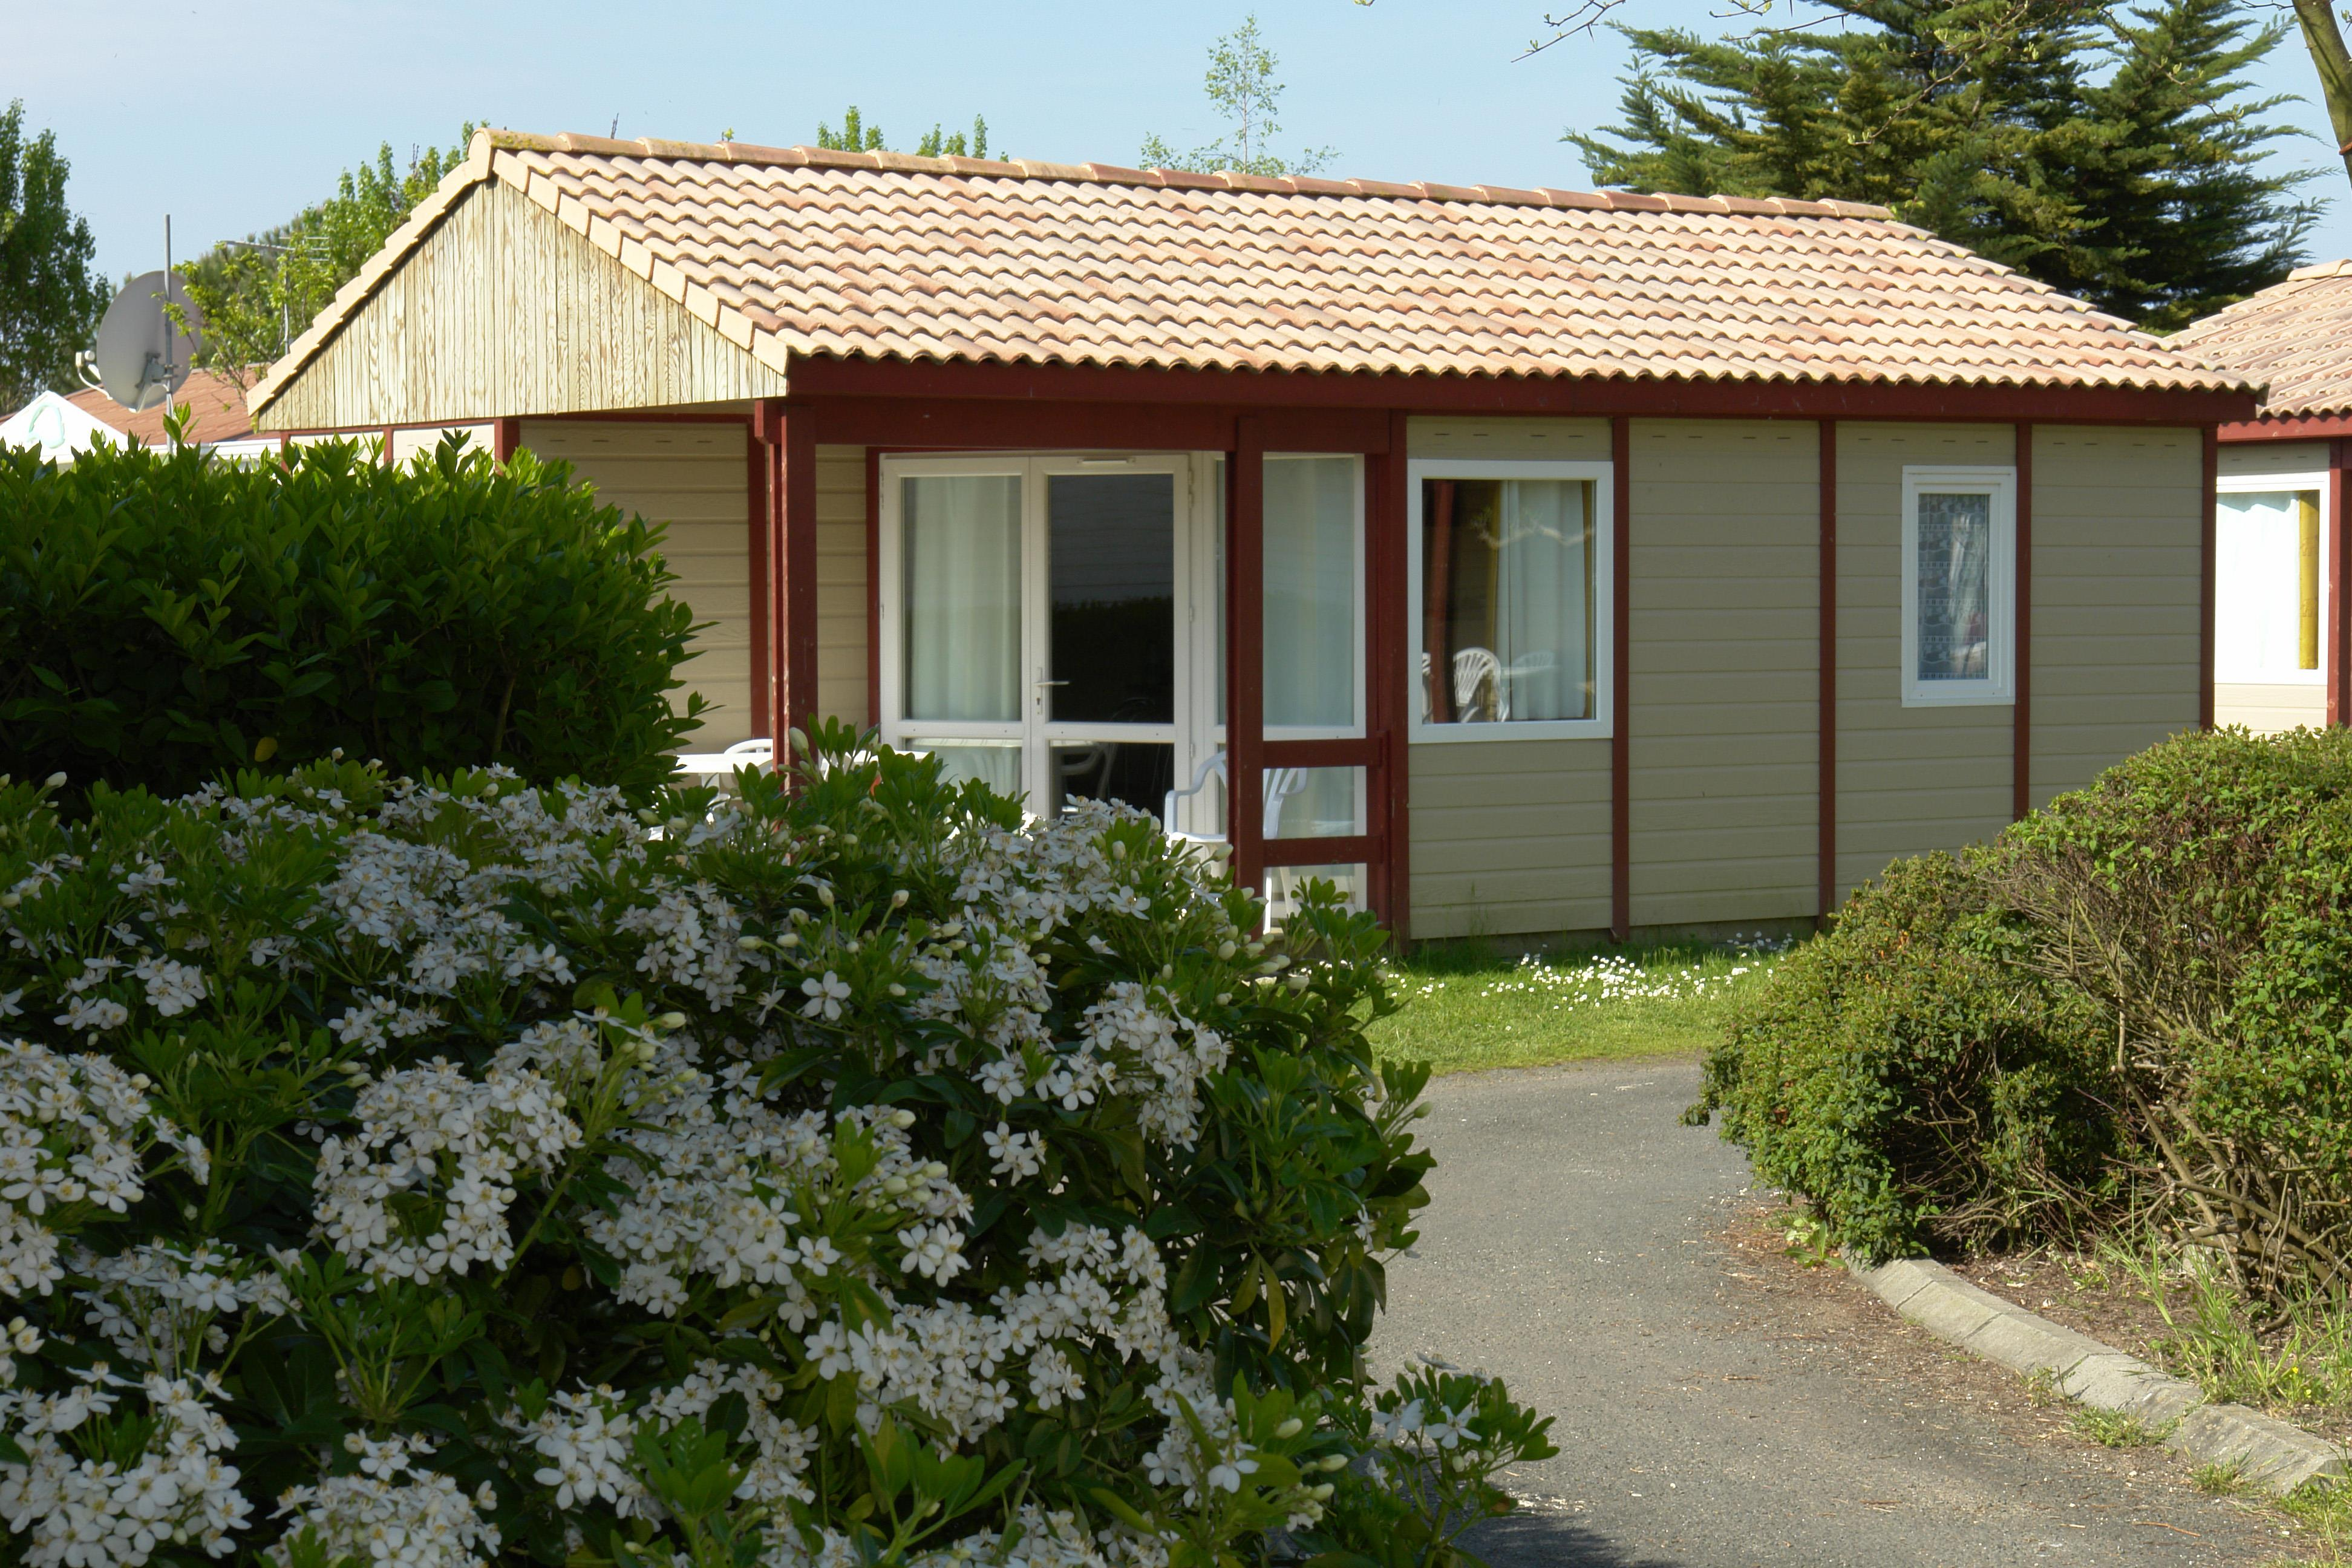 Location - Chalet Family - Camping La Brande